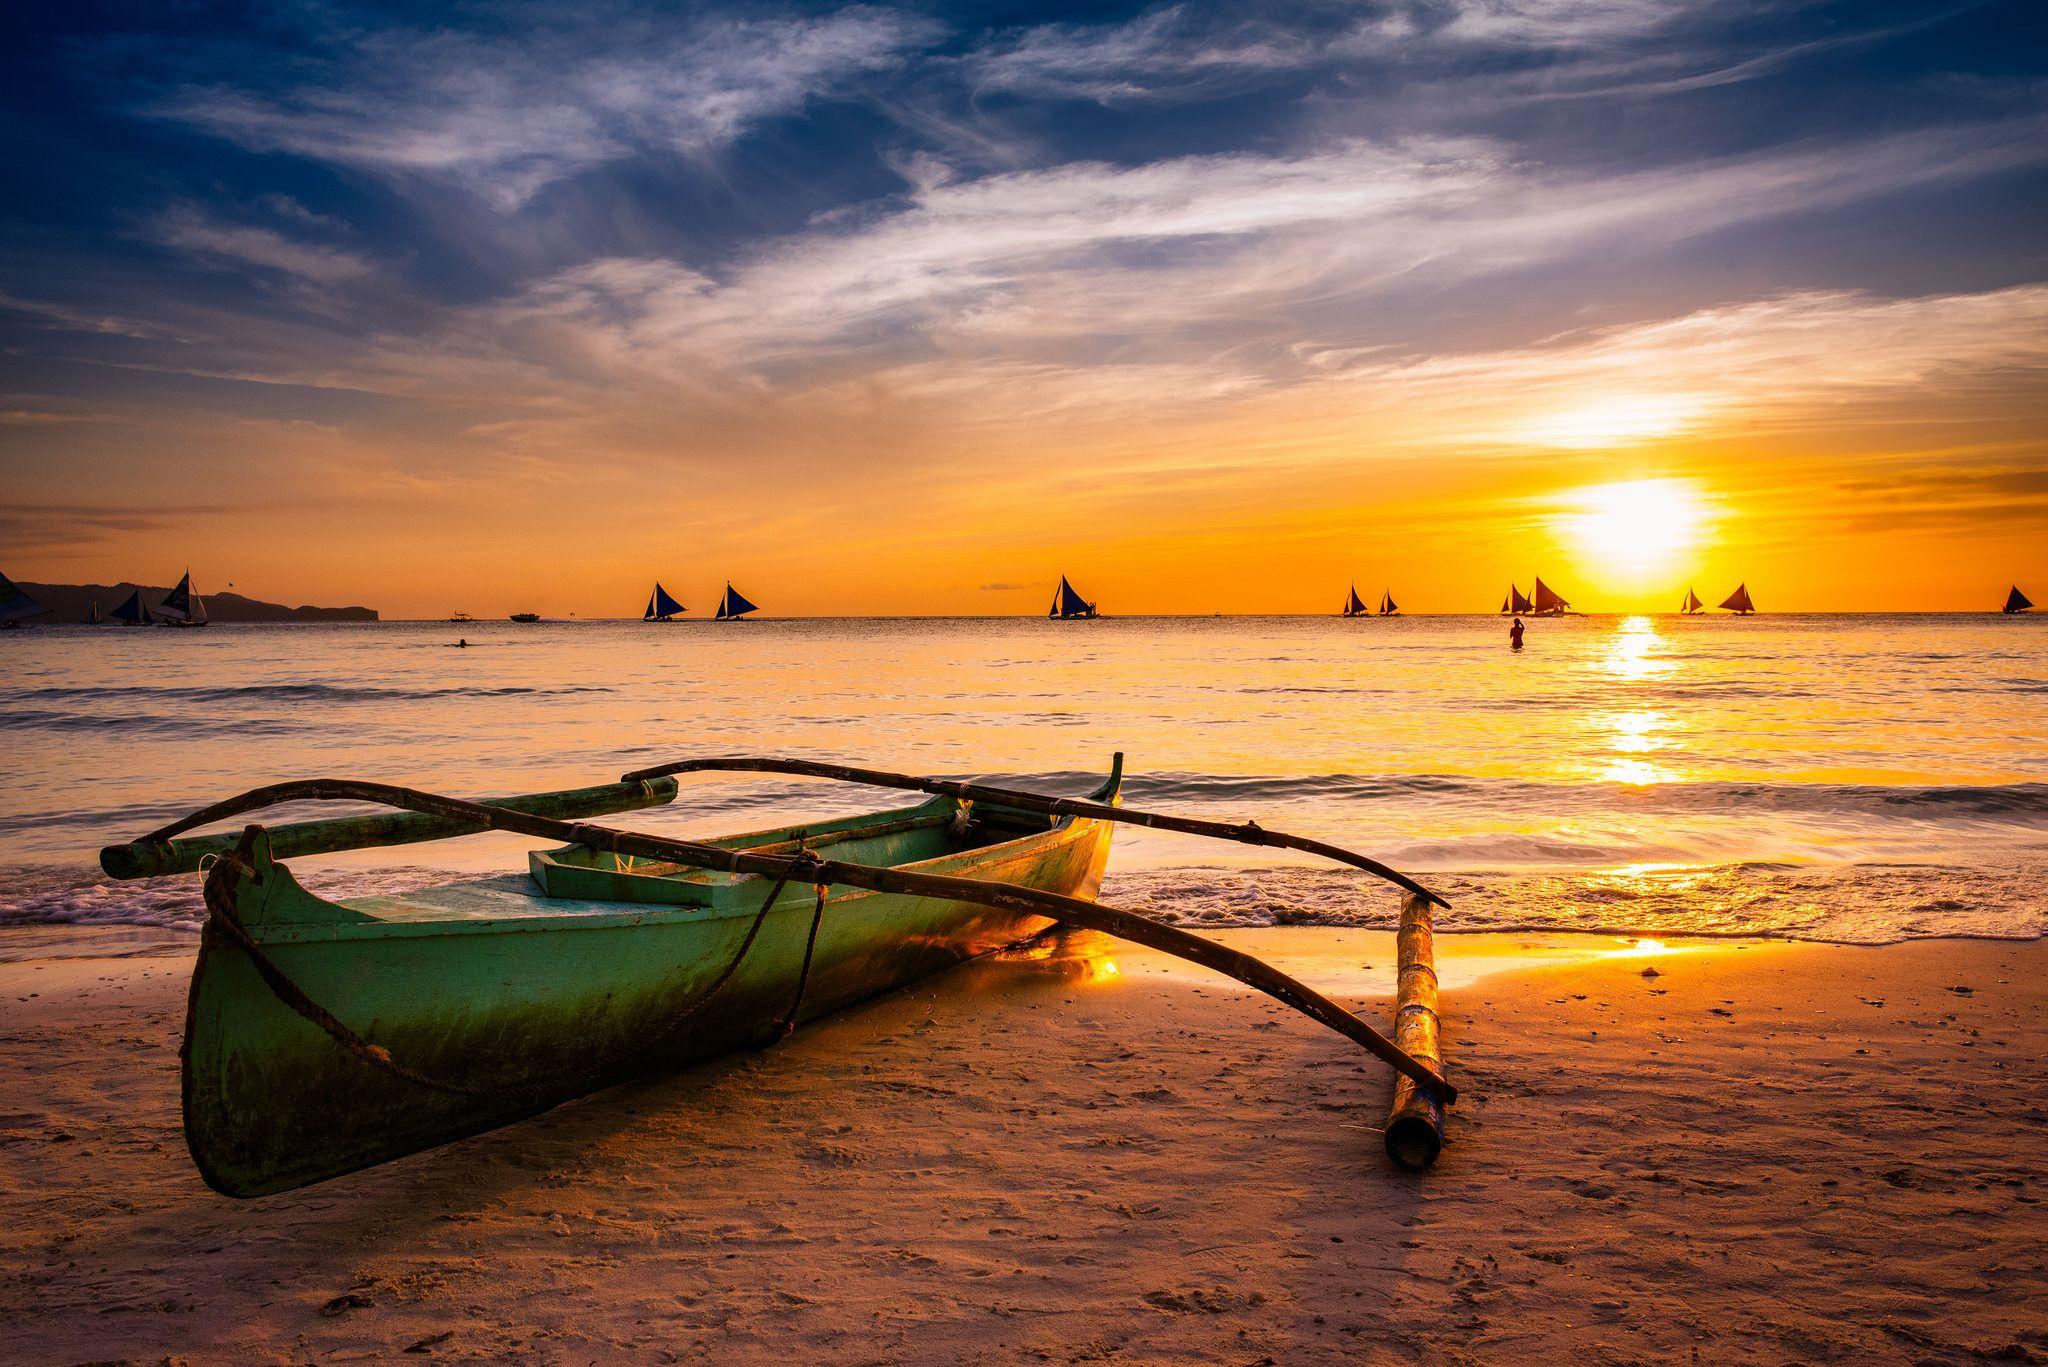 https://flic.kr/p/u6kYWr | Sunset at White Beach, Boracay, Philippines